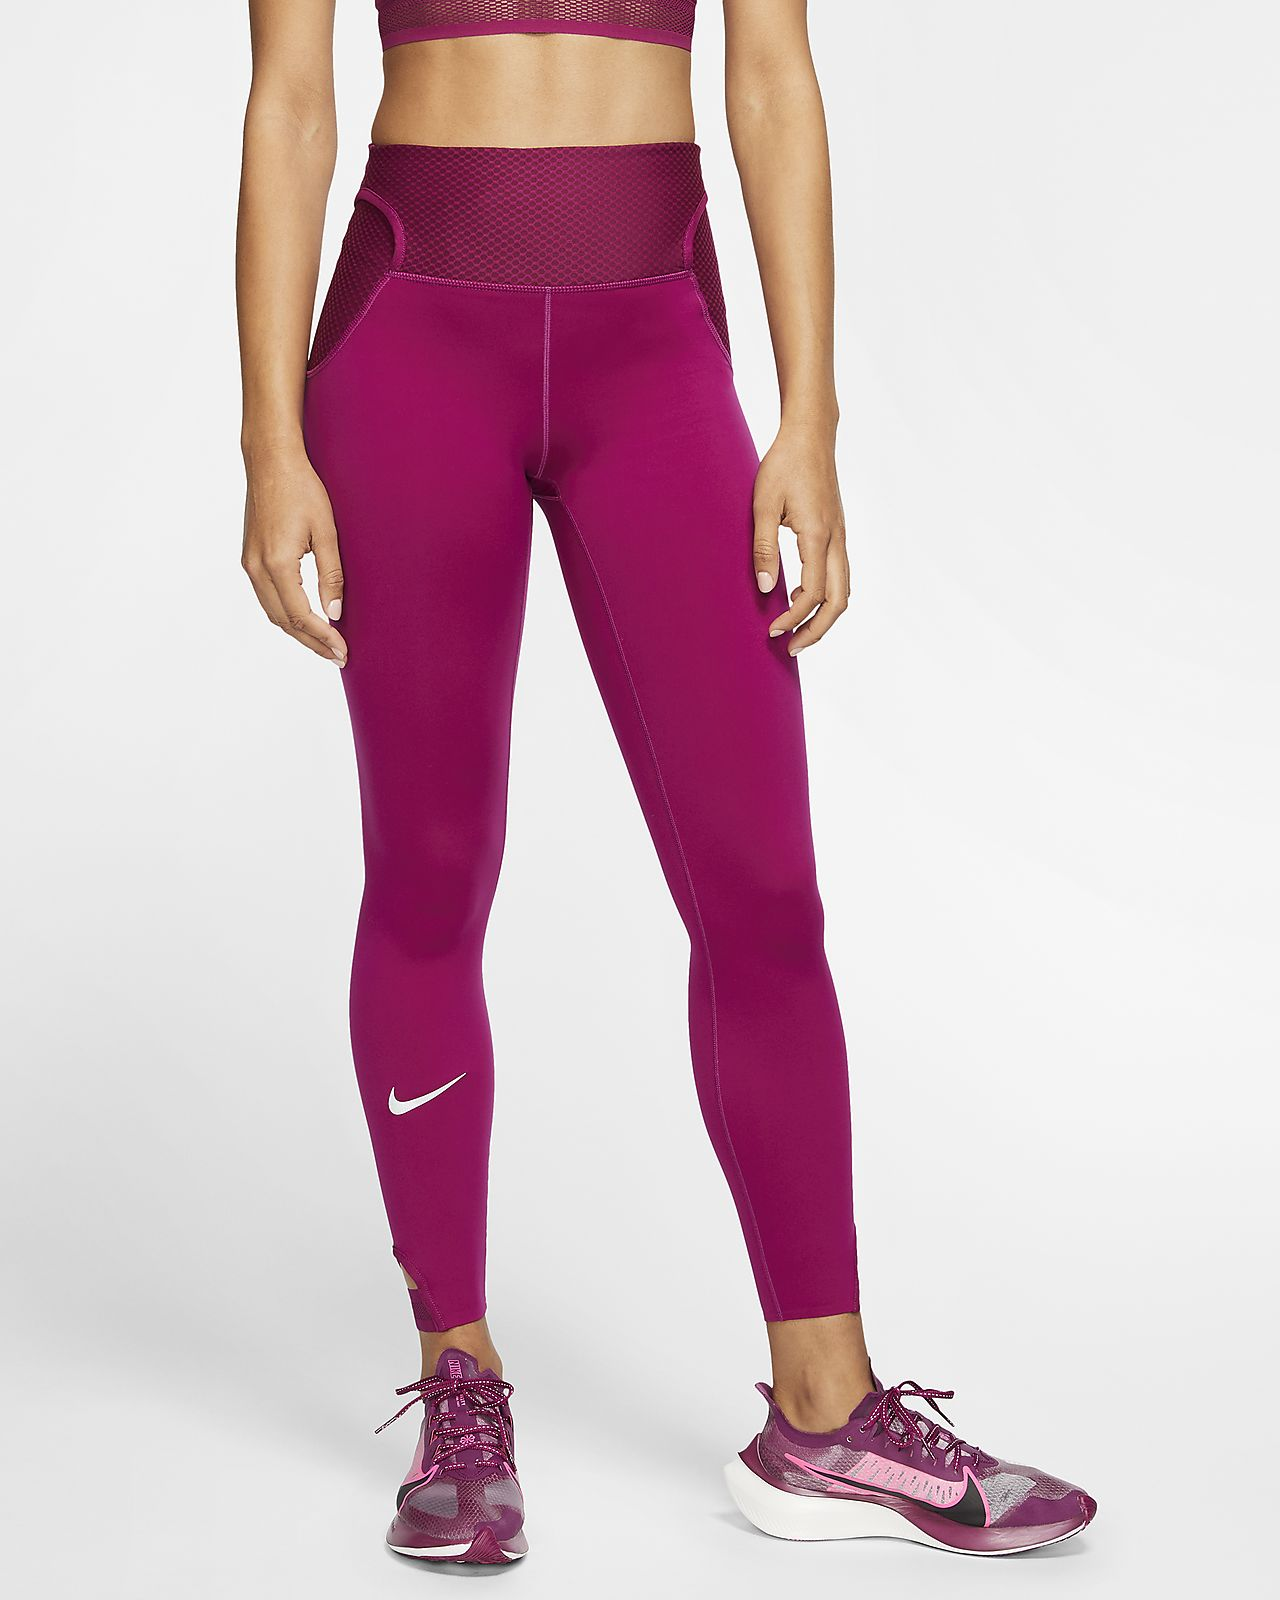 Tights de running a 7/8 Nike City Ready para mulher